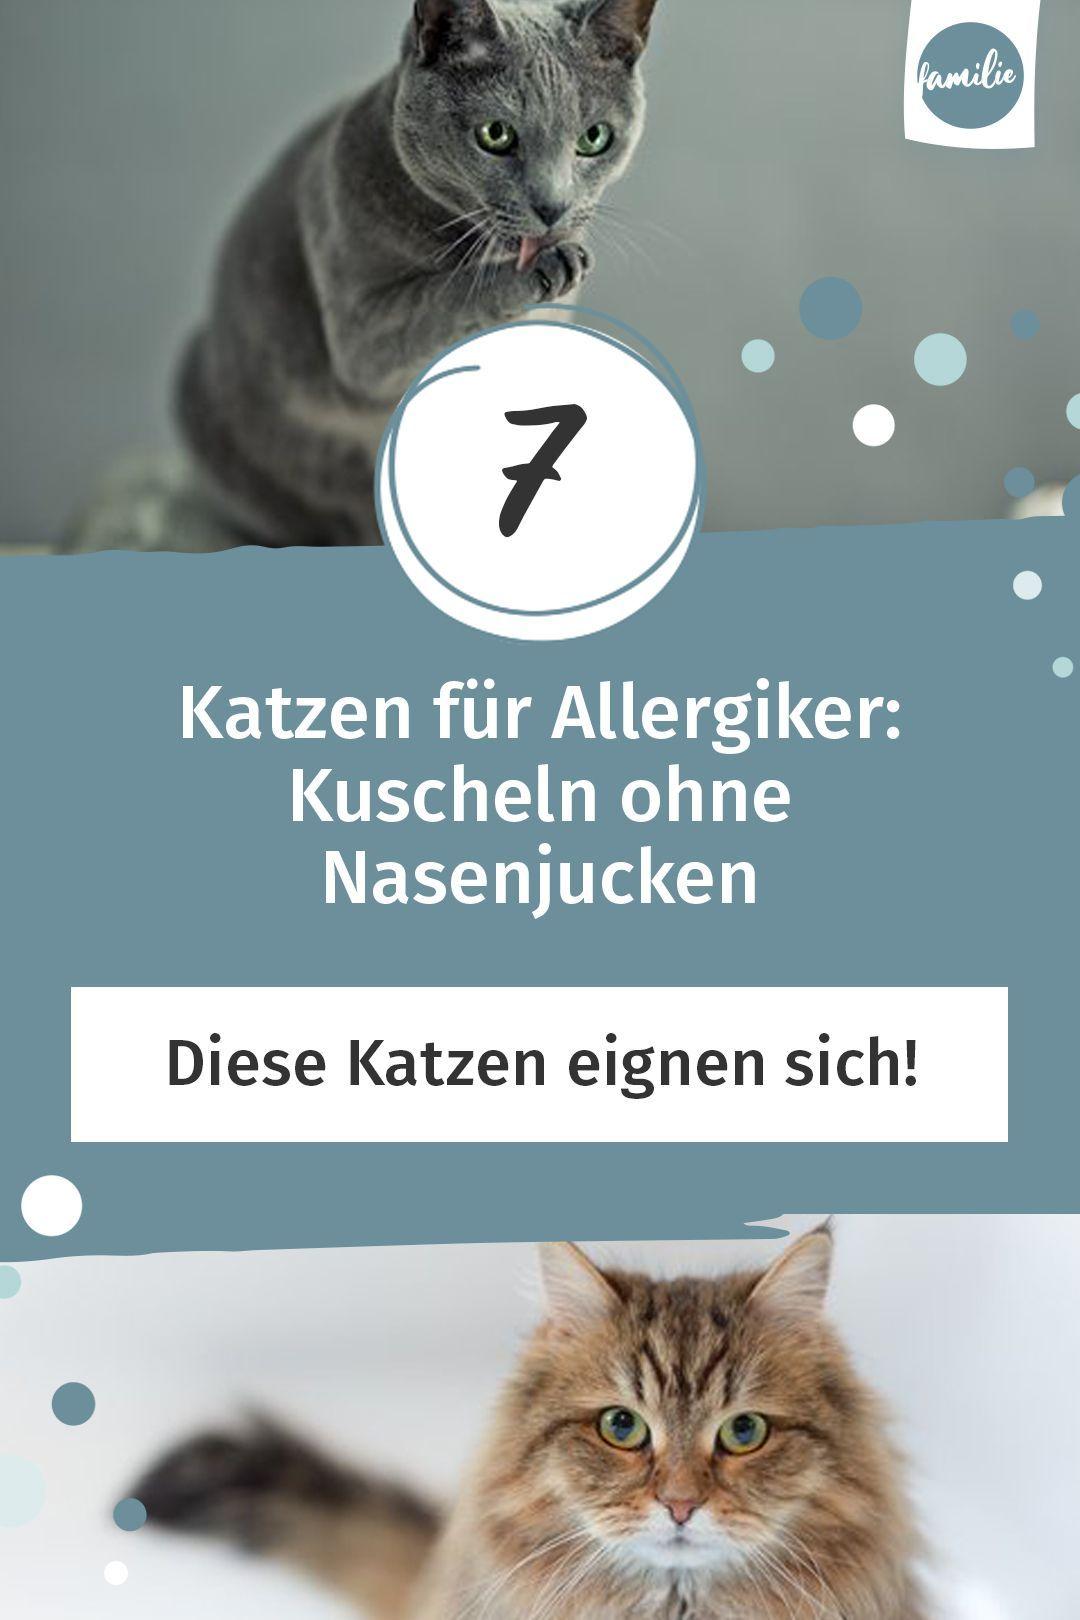 7 Katzen Fur Allergiker Kuscheln Ohne Nasenjucken Familie De In 2020 Katzen Fur Allergiker Katzen Kuscheln